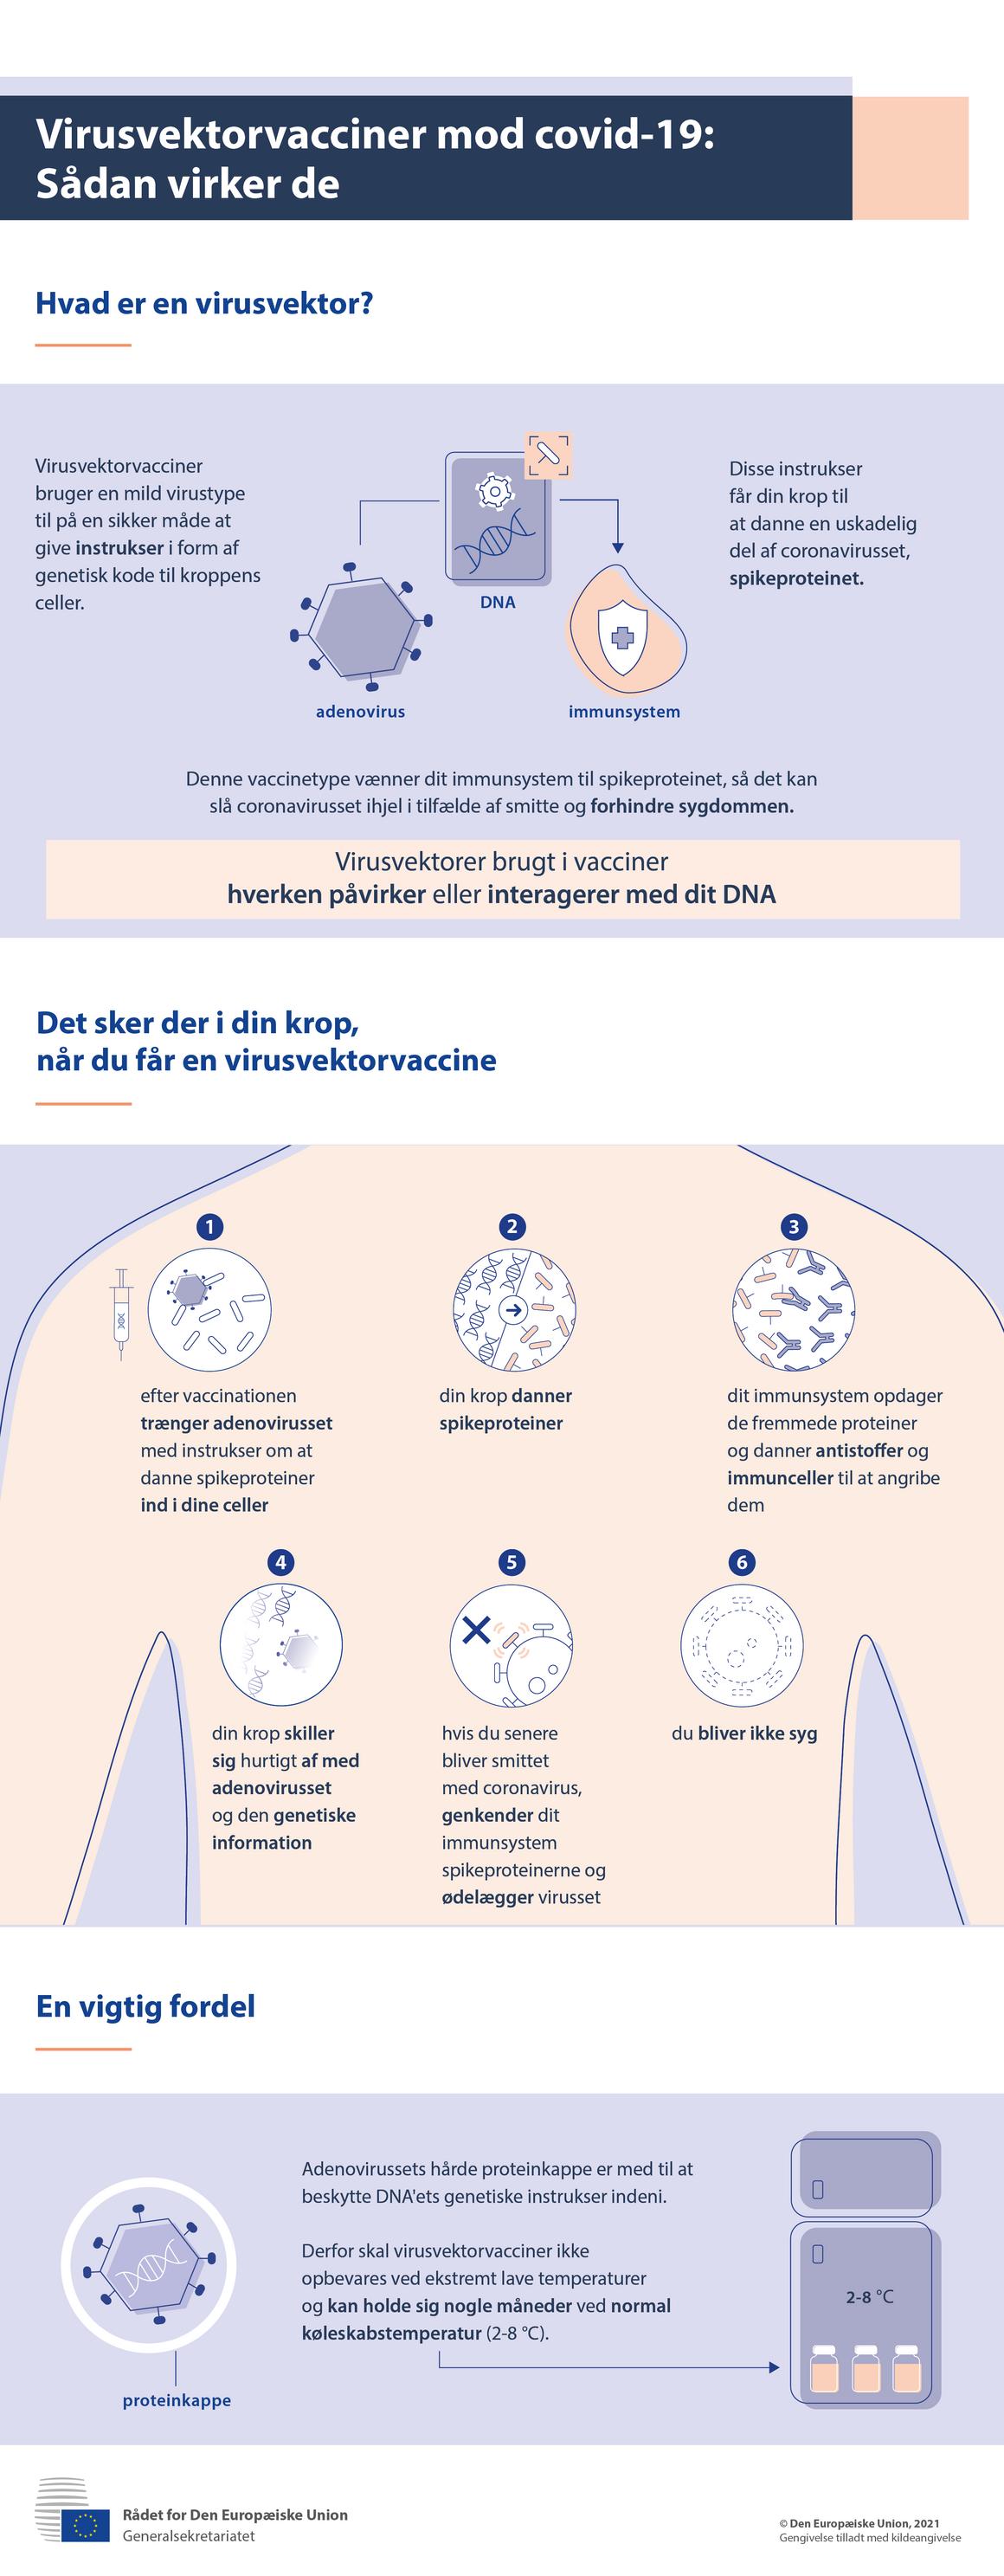 Infografik — Virusvektorvacciner mod covid-19: Sådan virker de